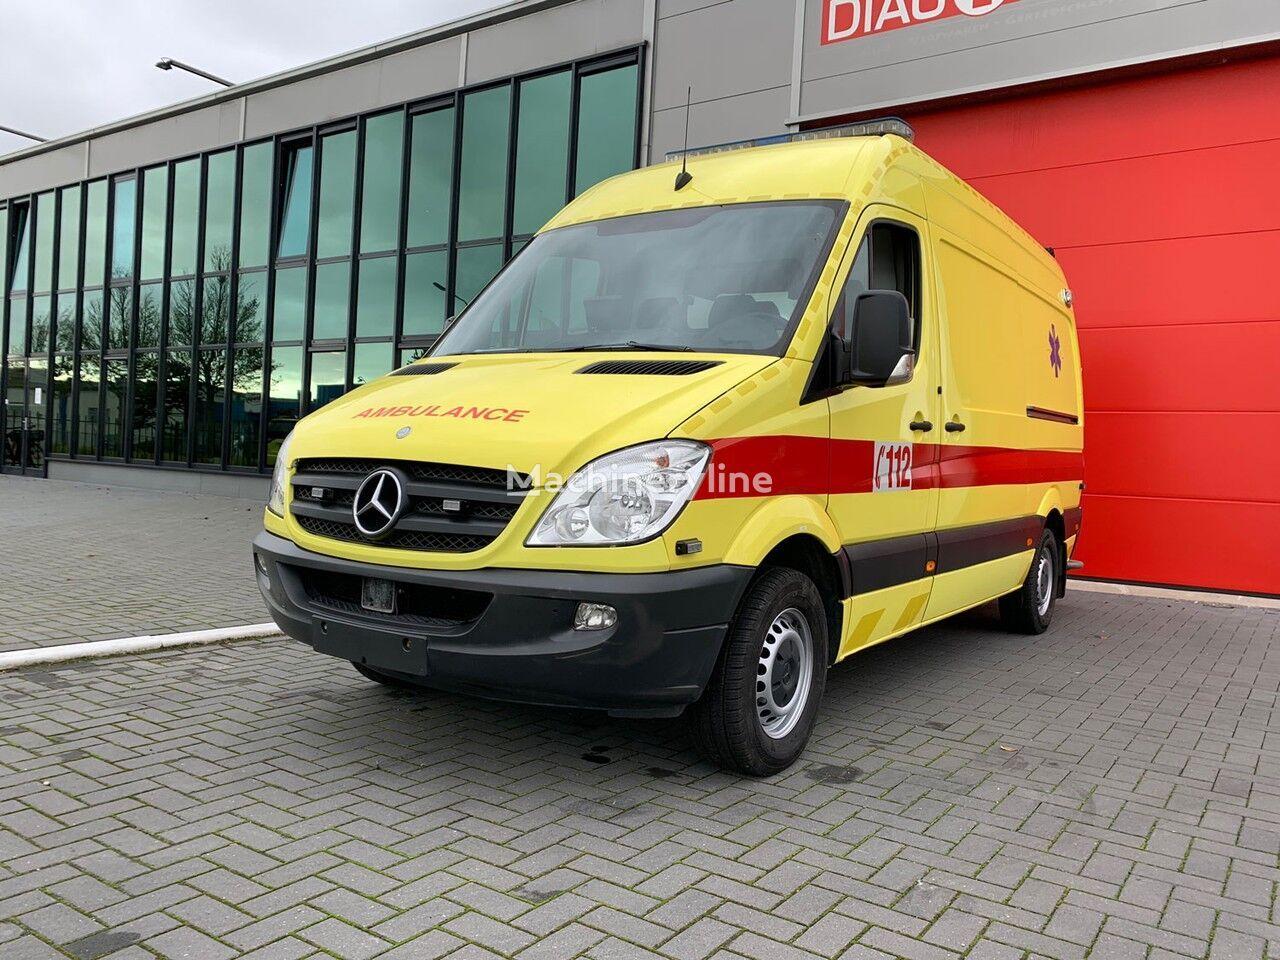 MERCEDES-BENZ 316 CDI Ambulance Belgian registration ambulancia